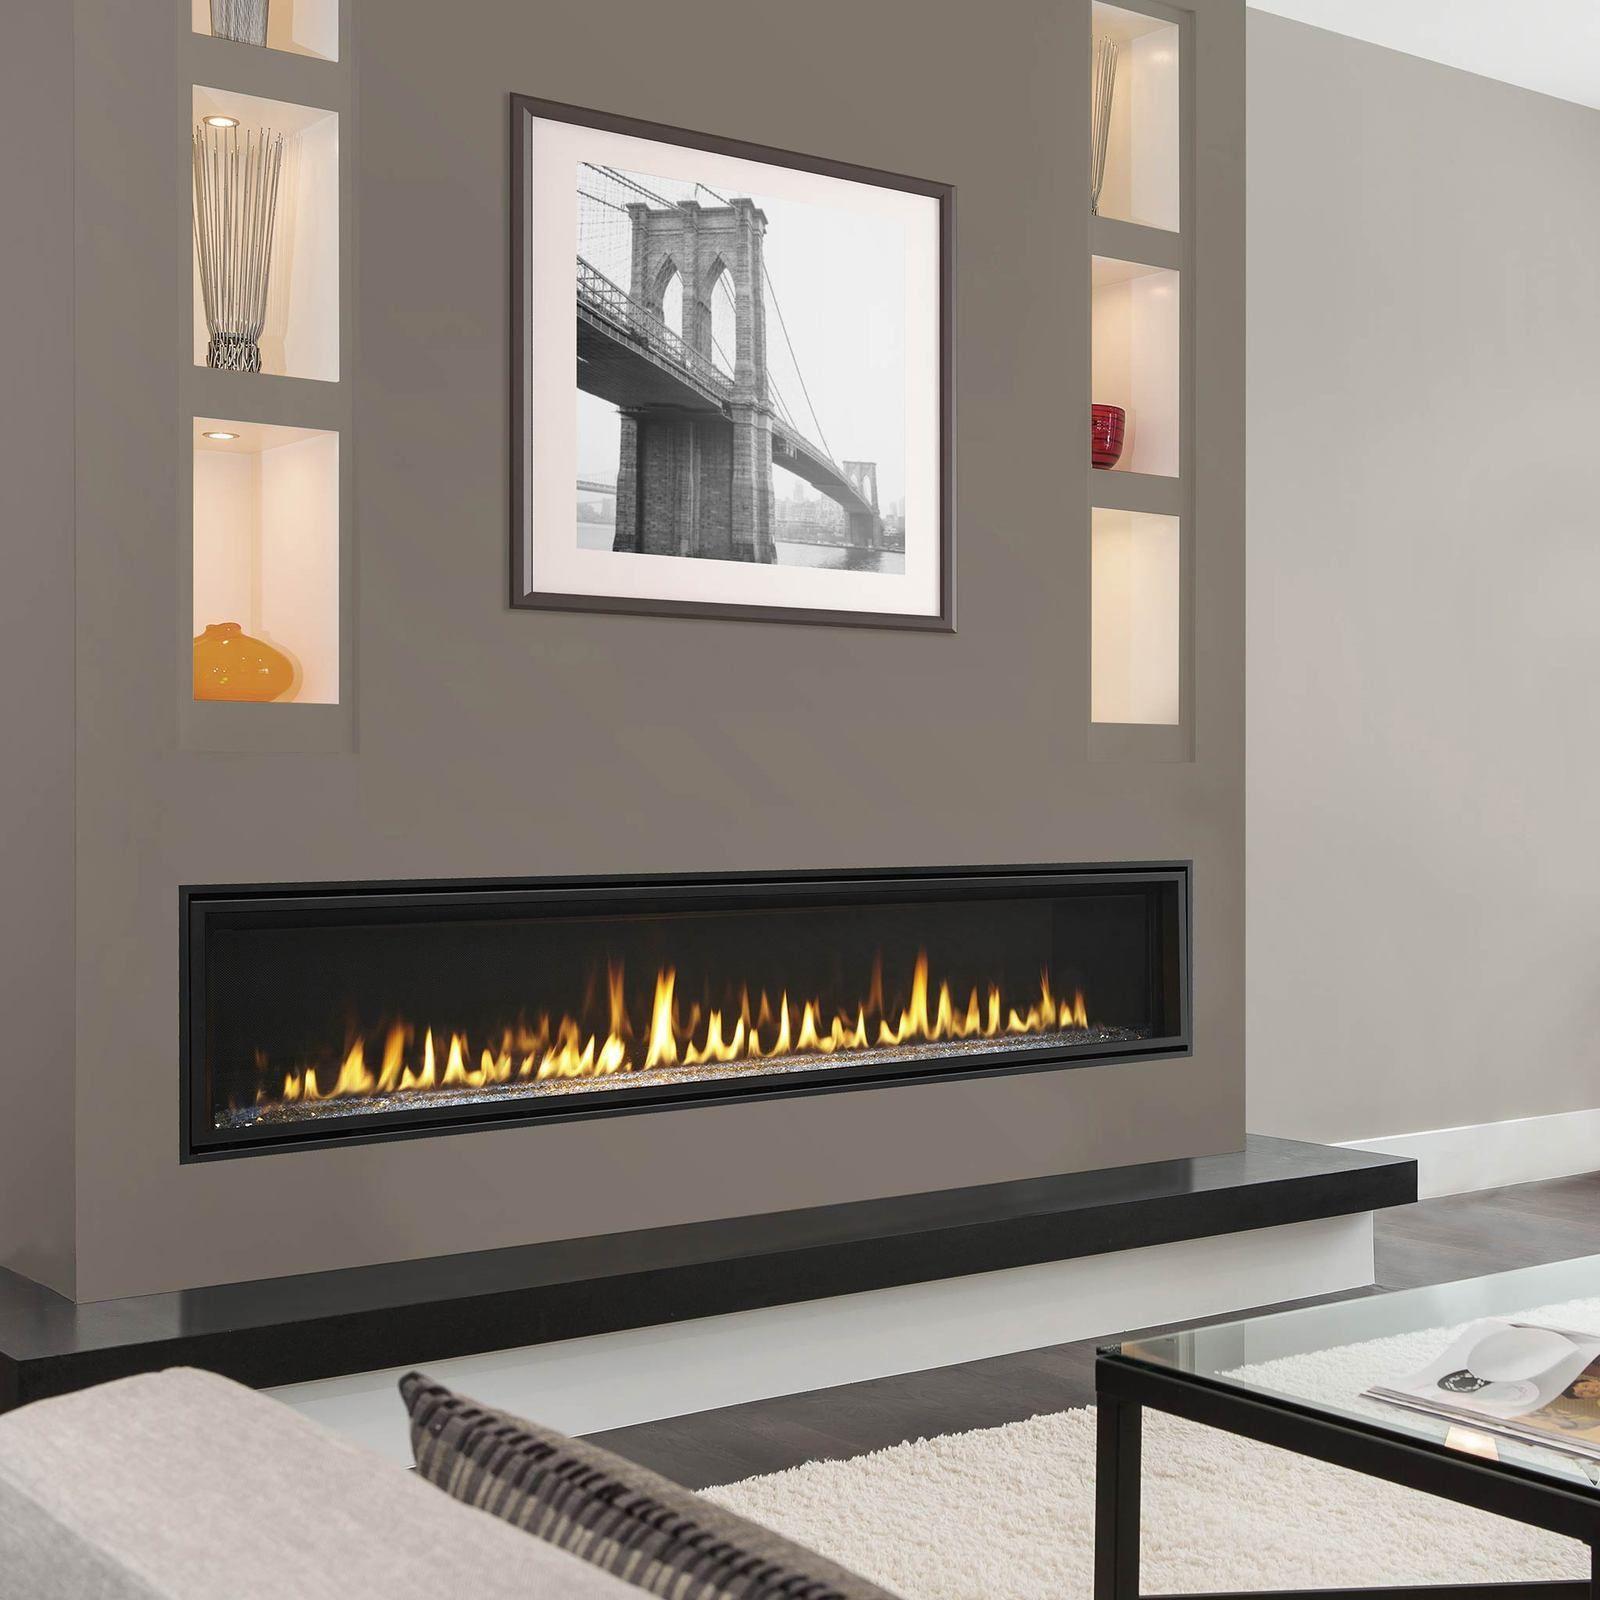 Echelon Ii Direct Vent Linear Gas Fireplace Vented Gas Firep